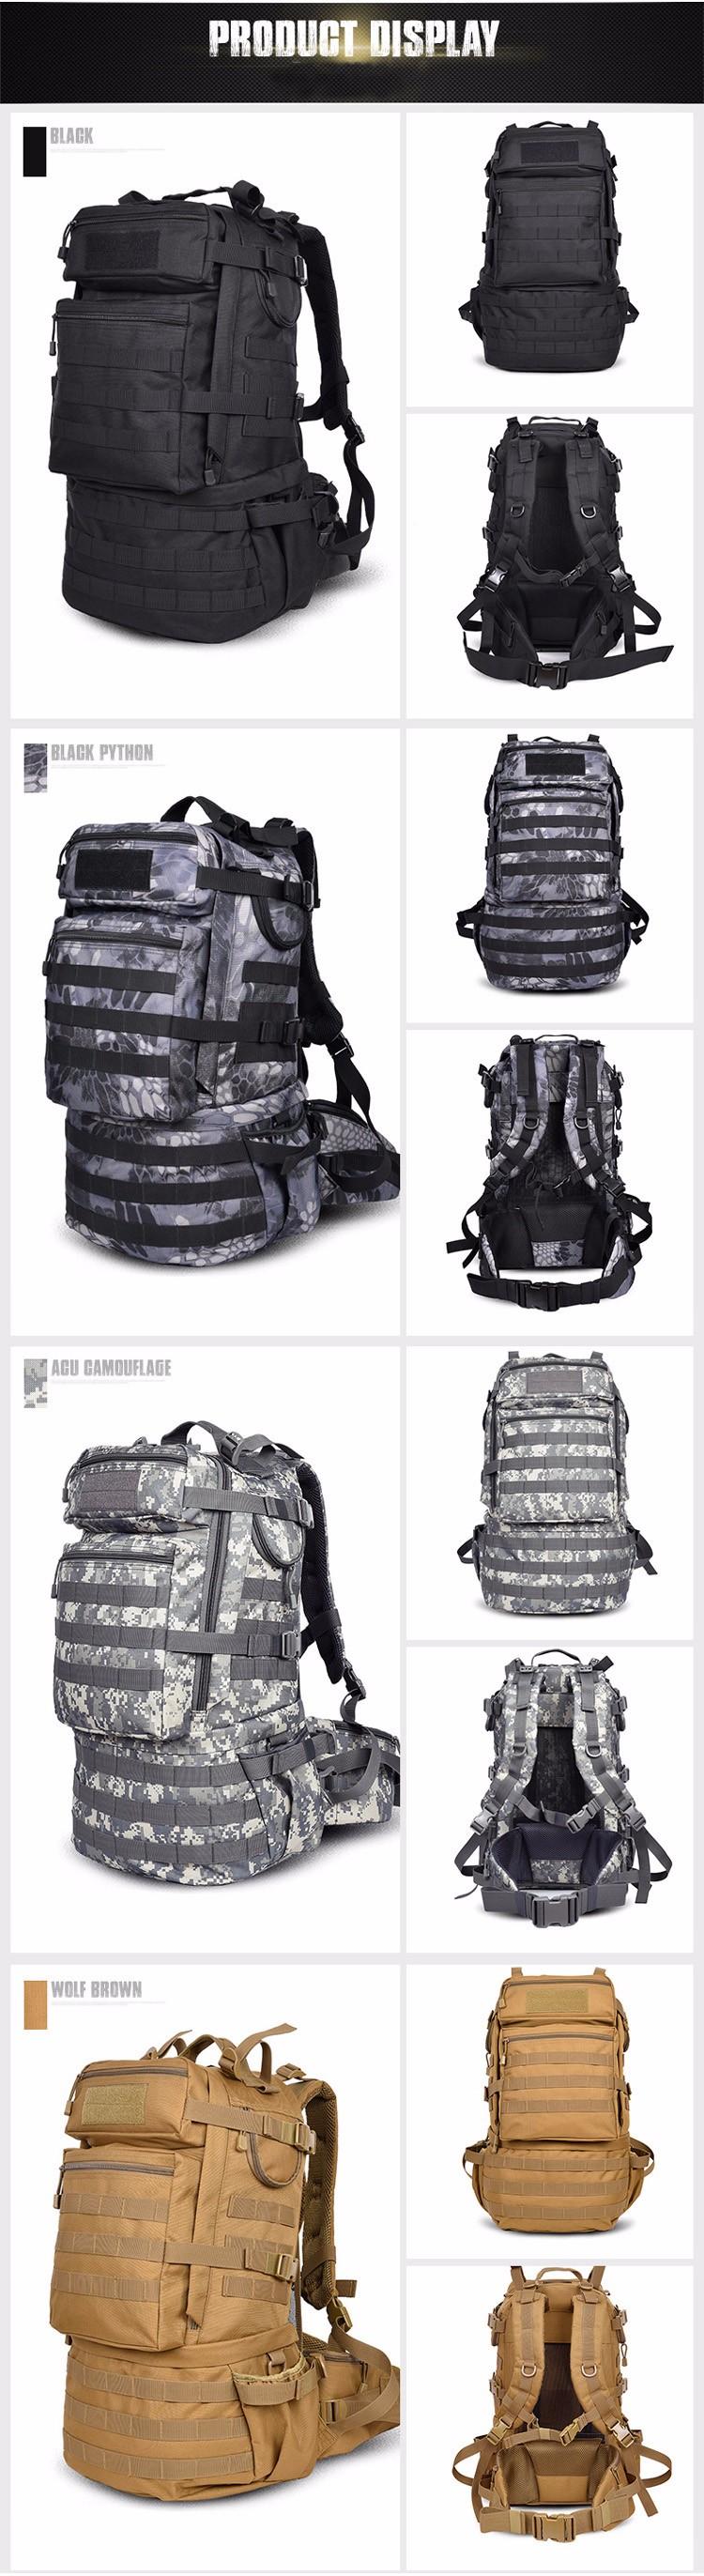 JEP Bag Army Discount 5